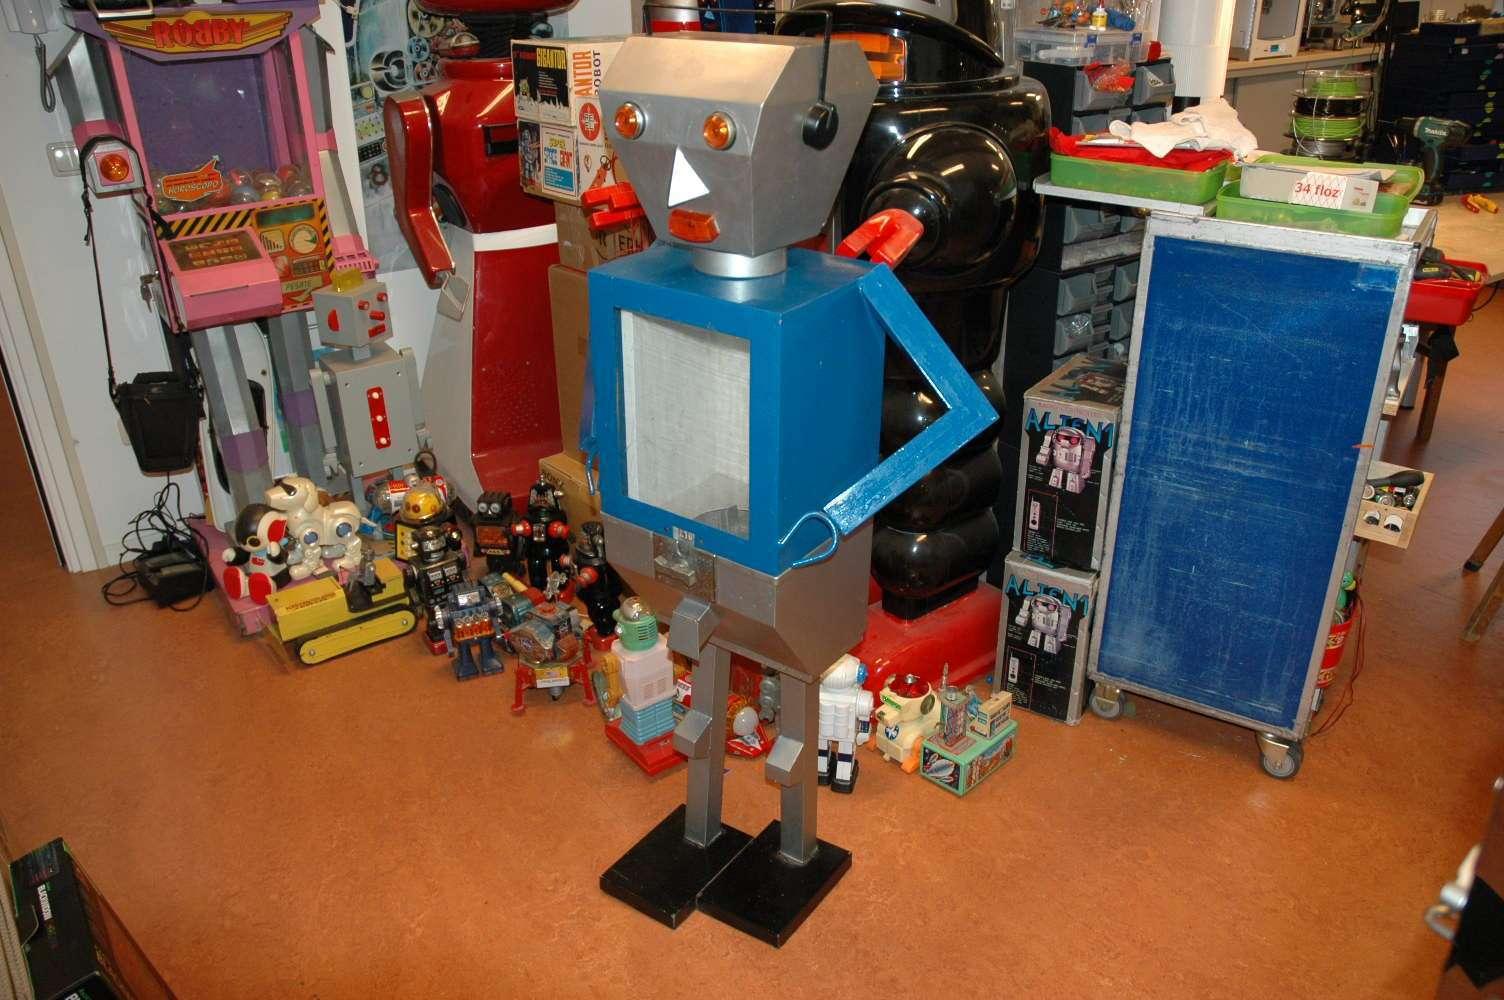 Italy - Gumball Vending Robot